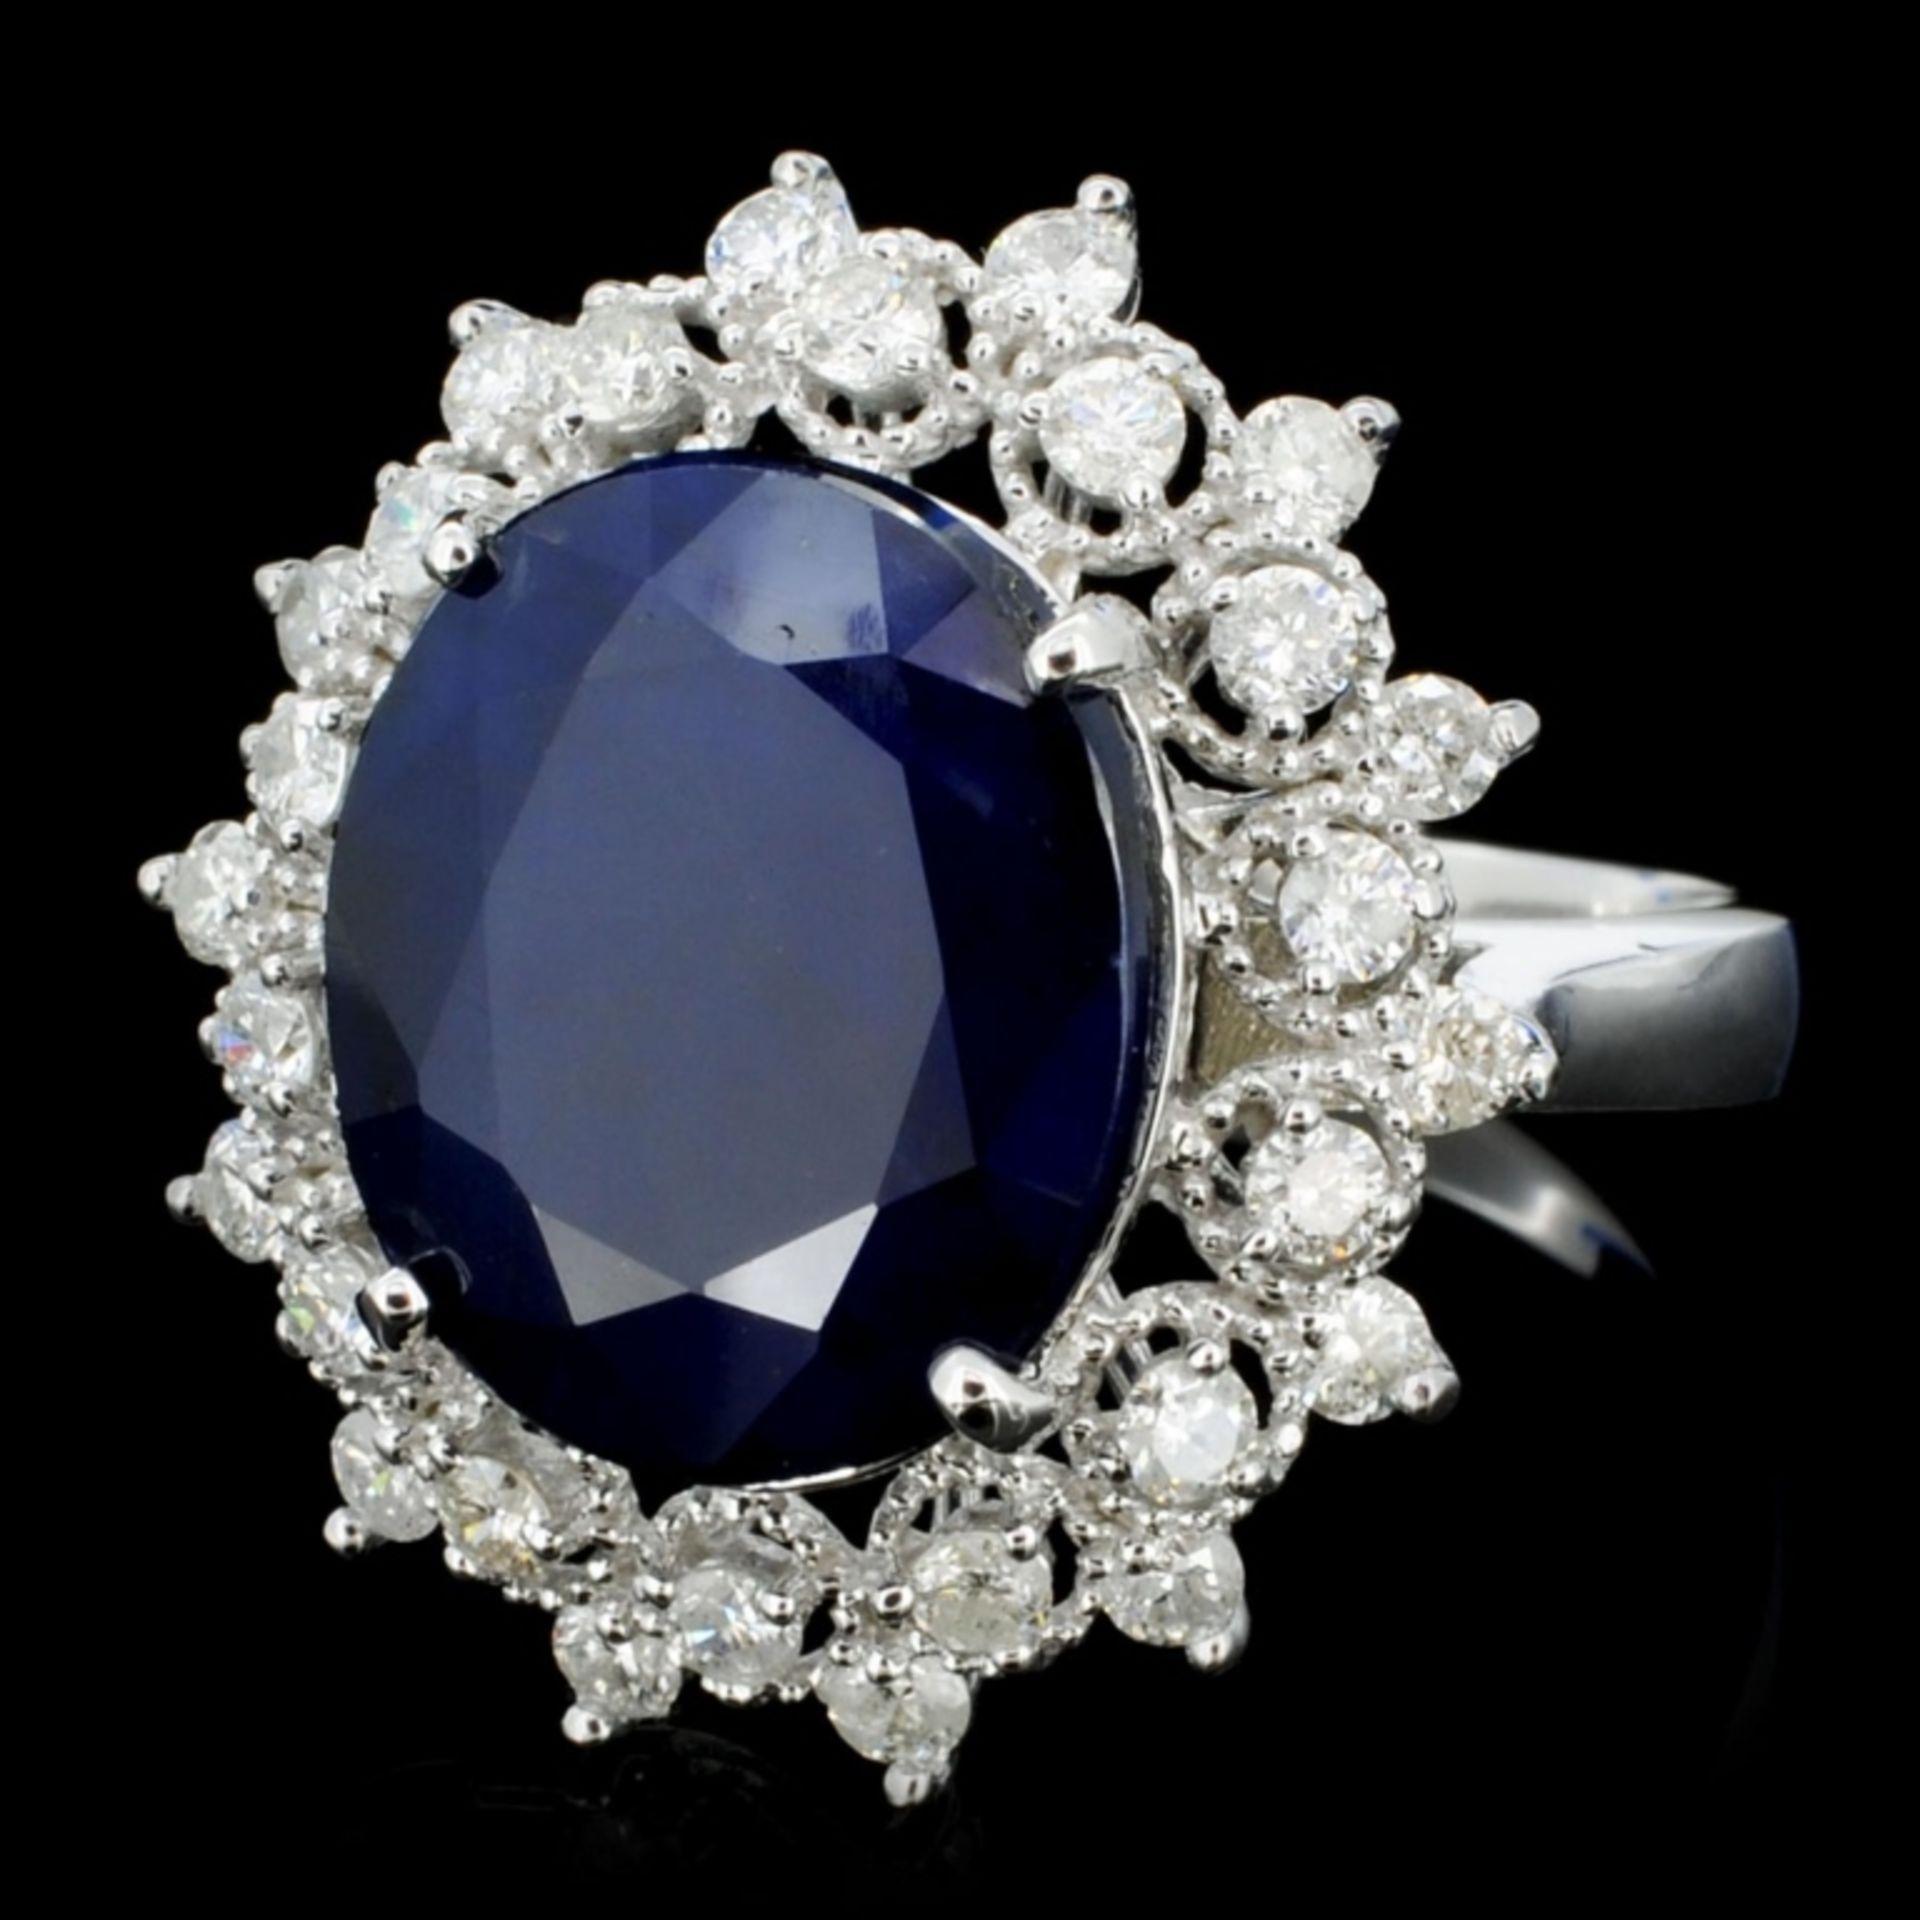 14K Gold 7.00ct Sapphire & 1.00ctw Diamond Ring - Image 2 of 4